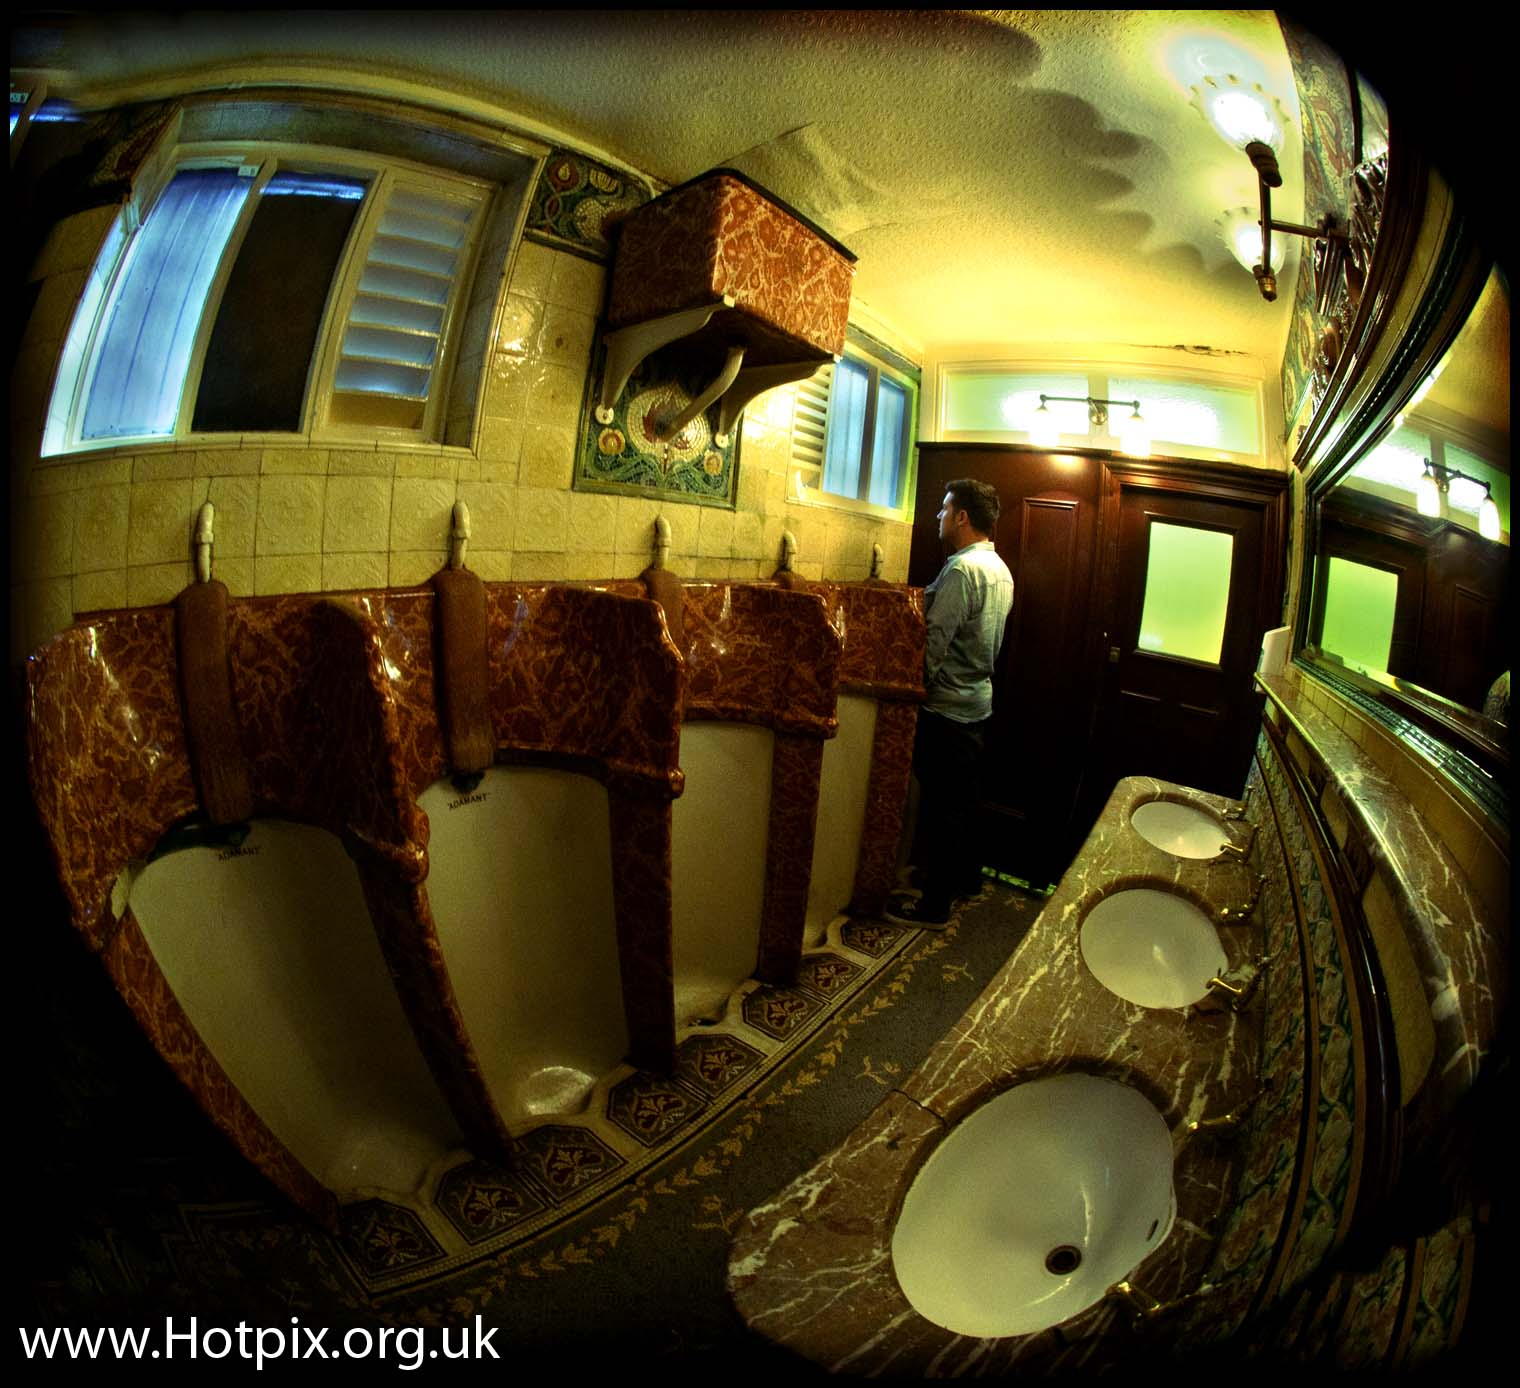 cool,stuff,liverpool,LPL,john,piss,lennon,airport,tourist,pissing,travel,traveller,building,grade,pub,drink,drinking,mersey,merseyside,river,north,west,england,UK,GB,great,britain,dock,docks,wide,shot,lomo,hotpix,hot,pics,pix,tonysmith,tony,smith,pee,peeing,urinating,man,men,hdr,urinal,pissoir,ipod,music,muchacha,femenina,de,la,mujer,se\u00f1ora,lady,female,woman,girl,\u5973\u6027\u30e1\u30b9\u306e\u5973\u6027\u306e\u5973\u306e\u5b50,\u592b\u4eba\u5973\u6027\u5987\u5973\u5973\u5b69,fille,f\u00e9minine,femme,dame,#tonysmithhotpix,#tonysmithotpix